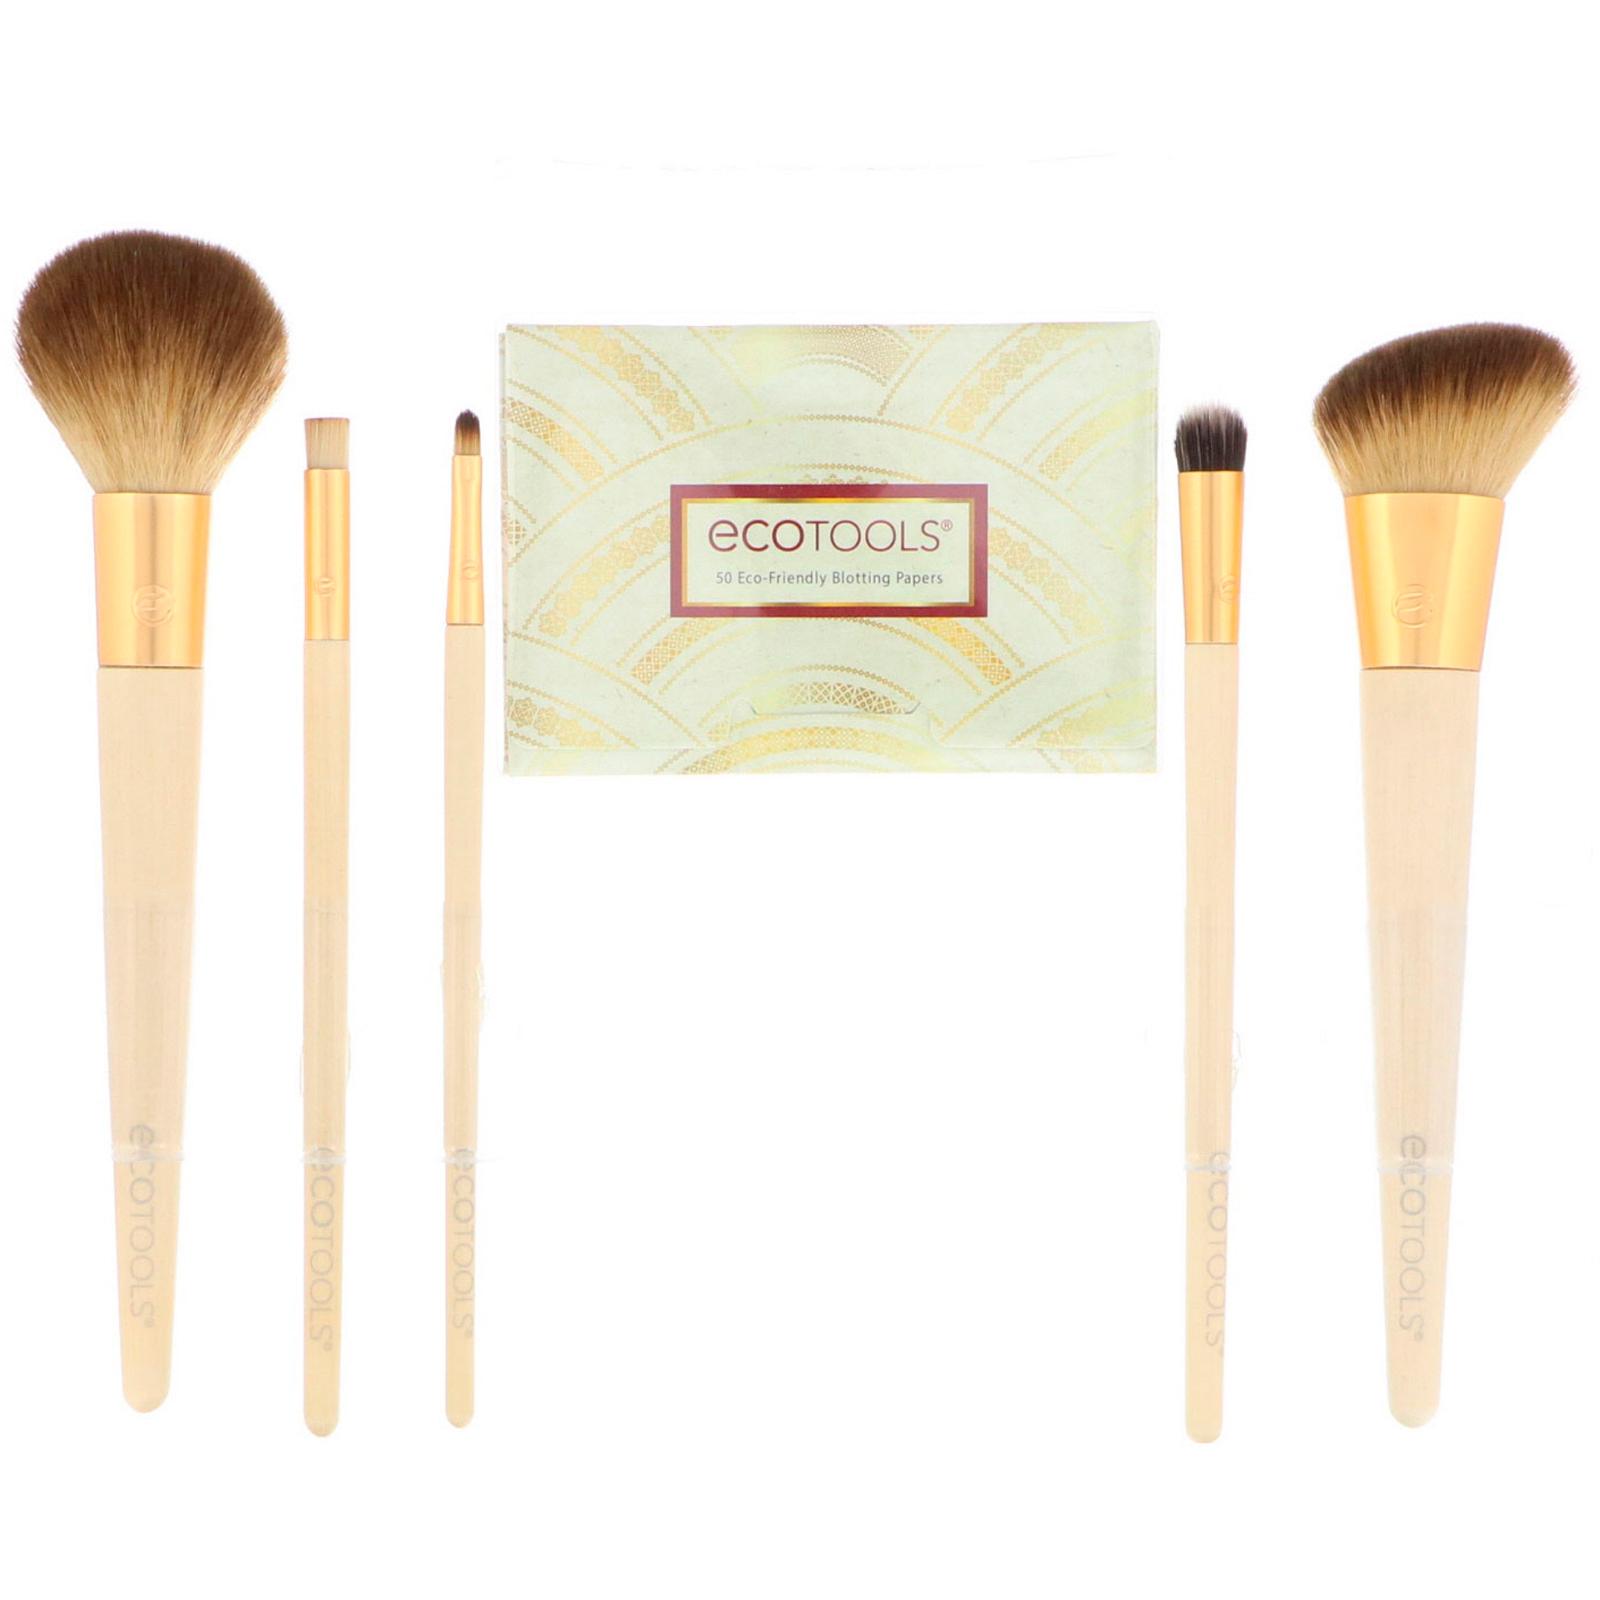 Ecotools Make A Bold Statement Beauty Kit 6 Piece Kit Iherb